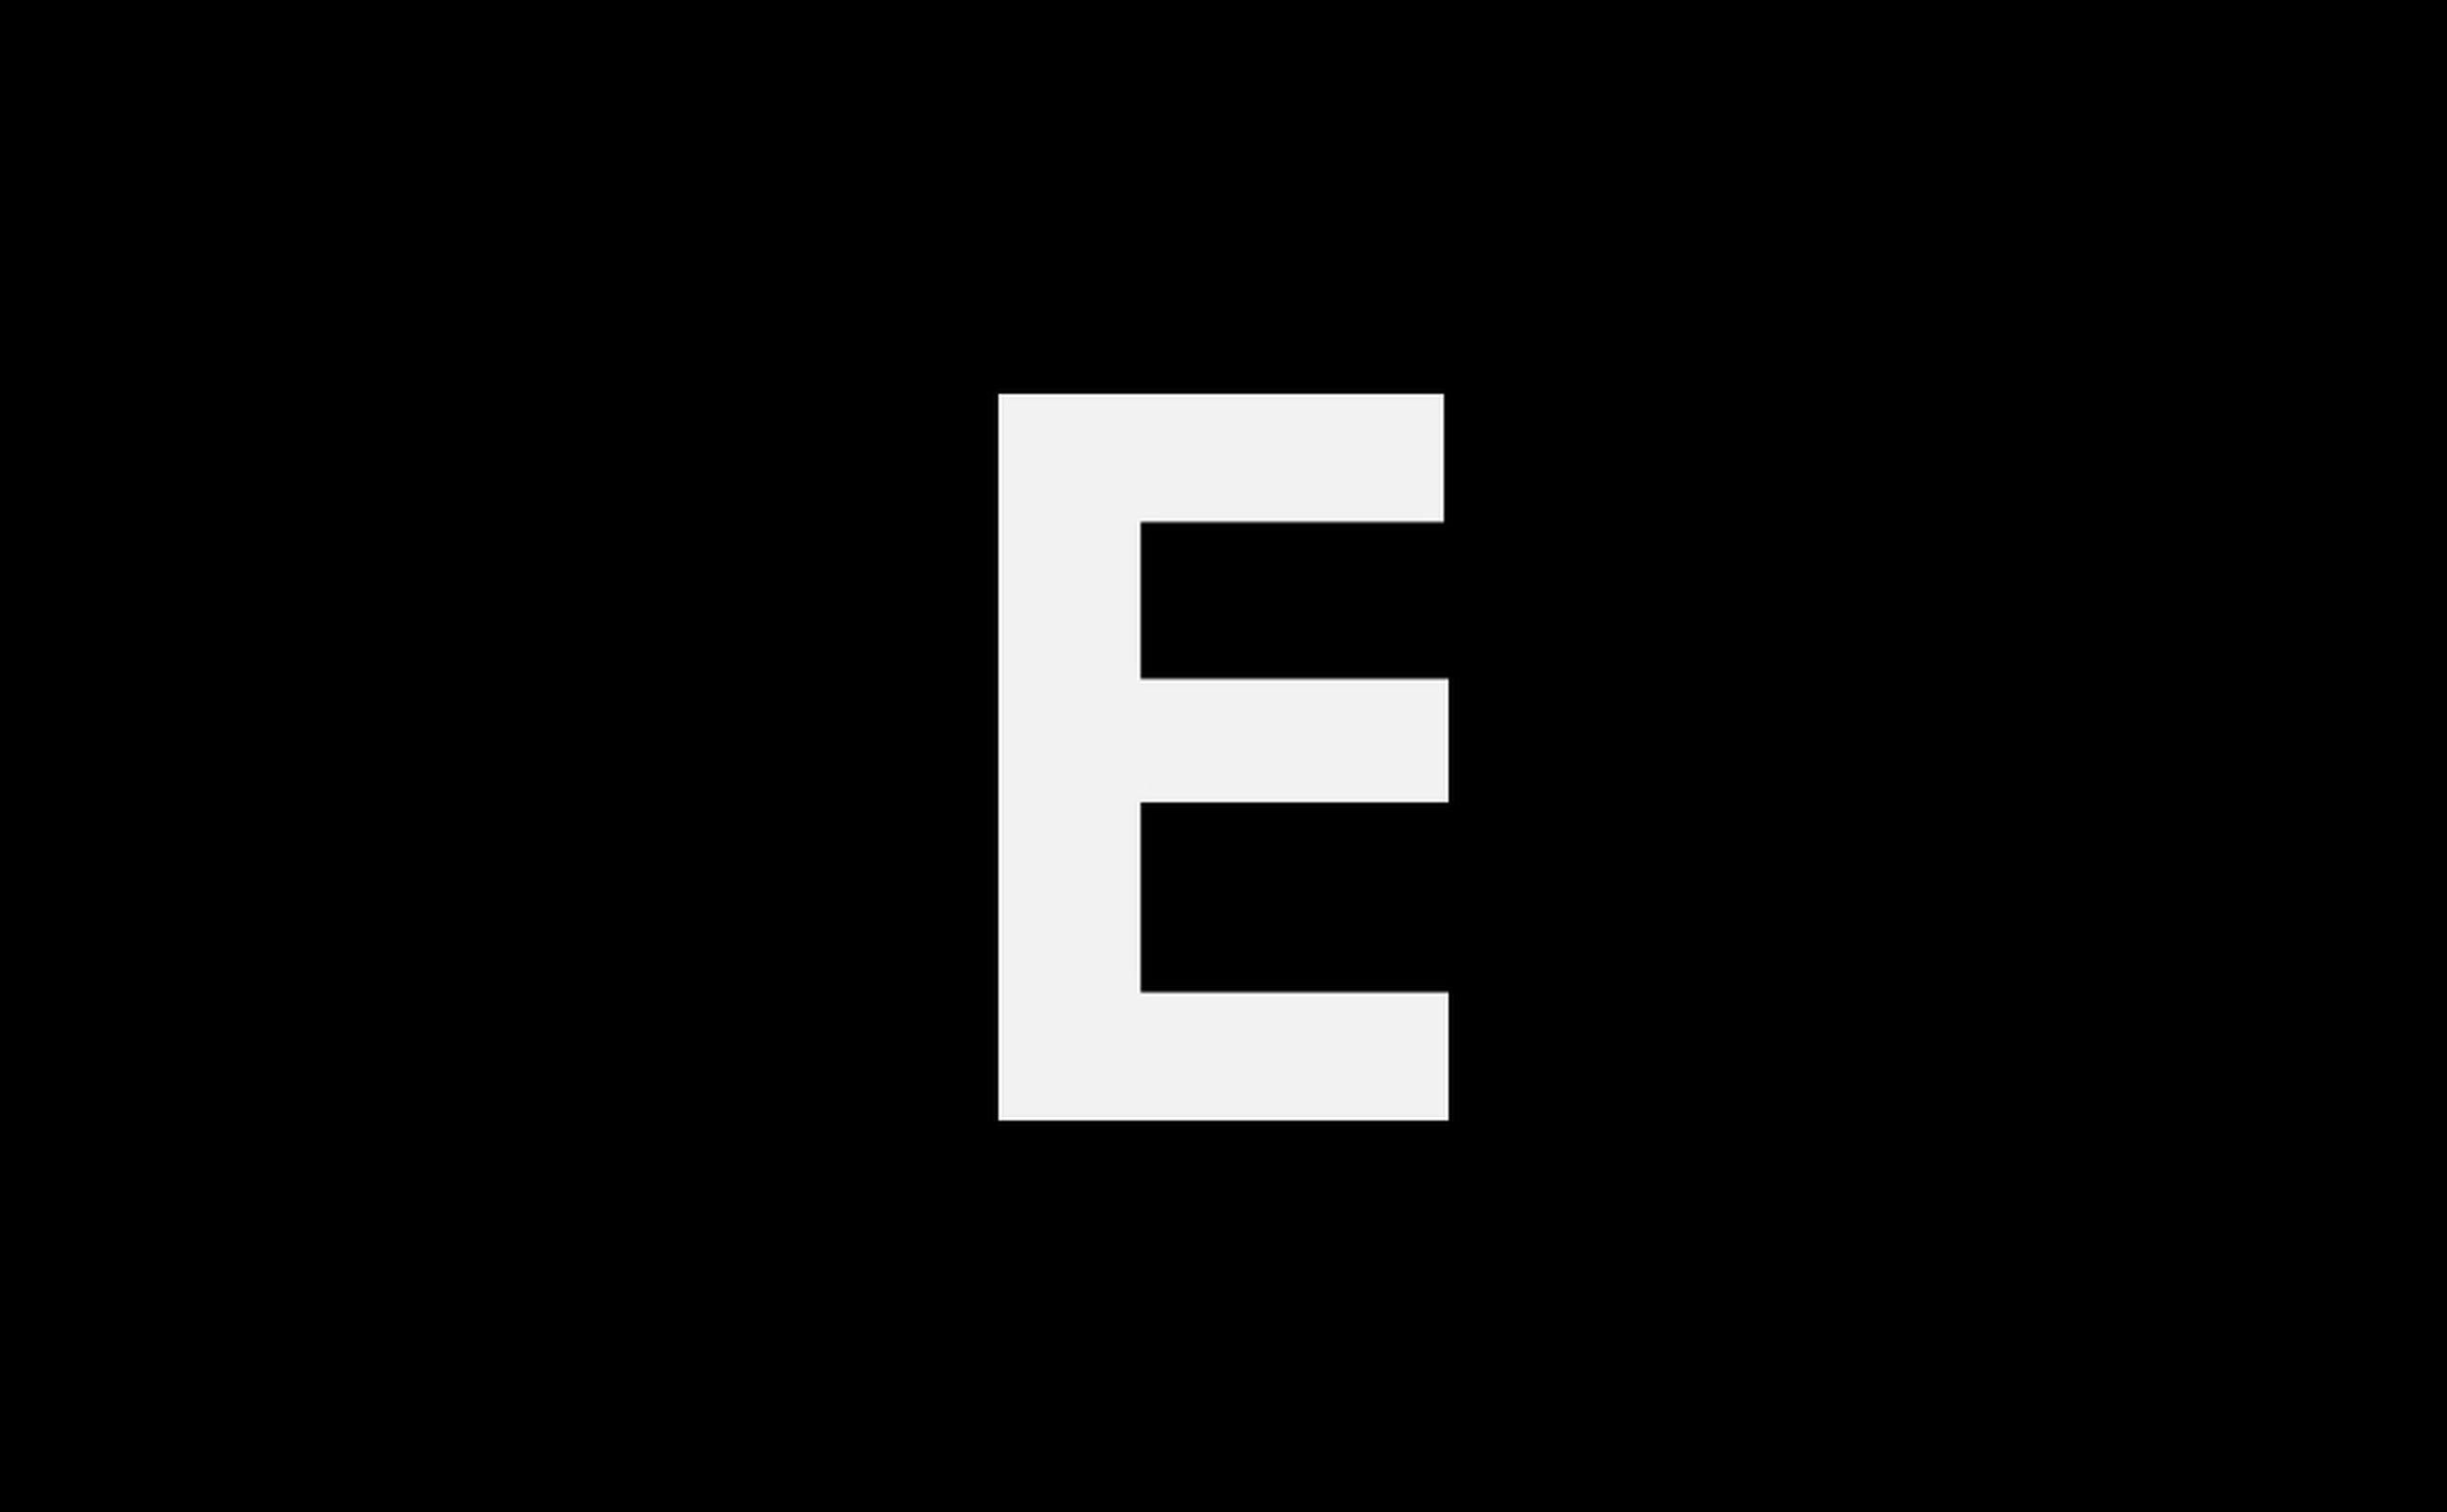 PORTRAIT OF SMILING MAN RELAXING ON TILED FLOOR